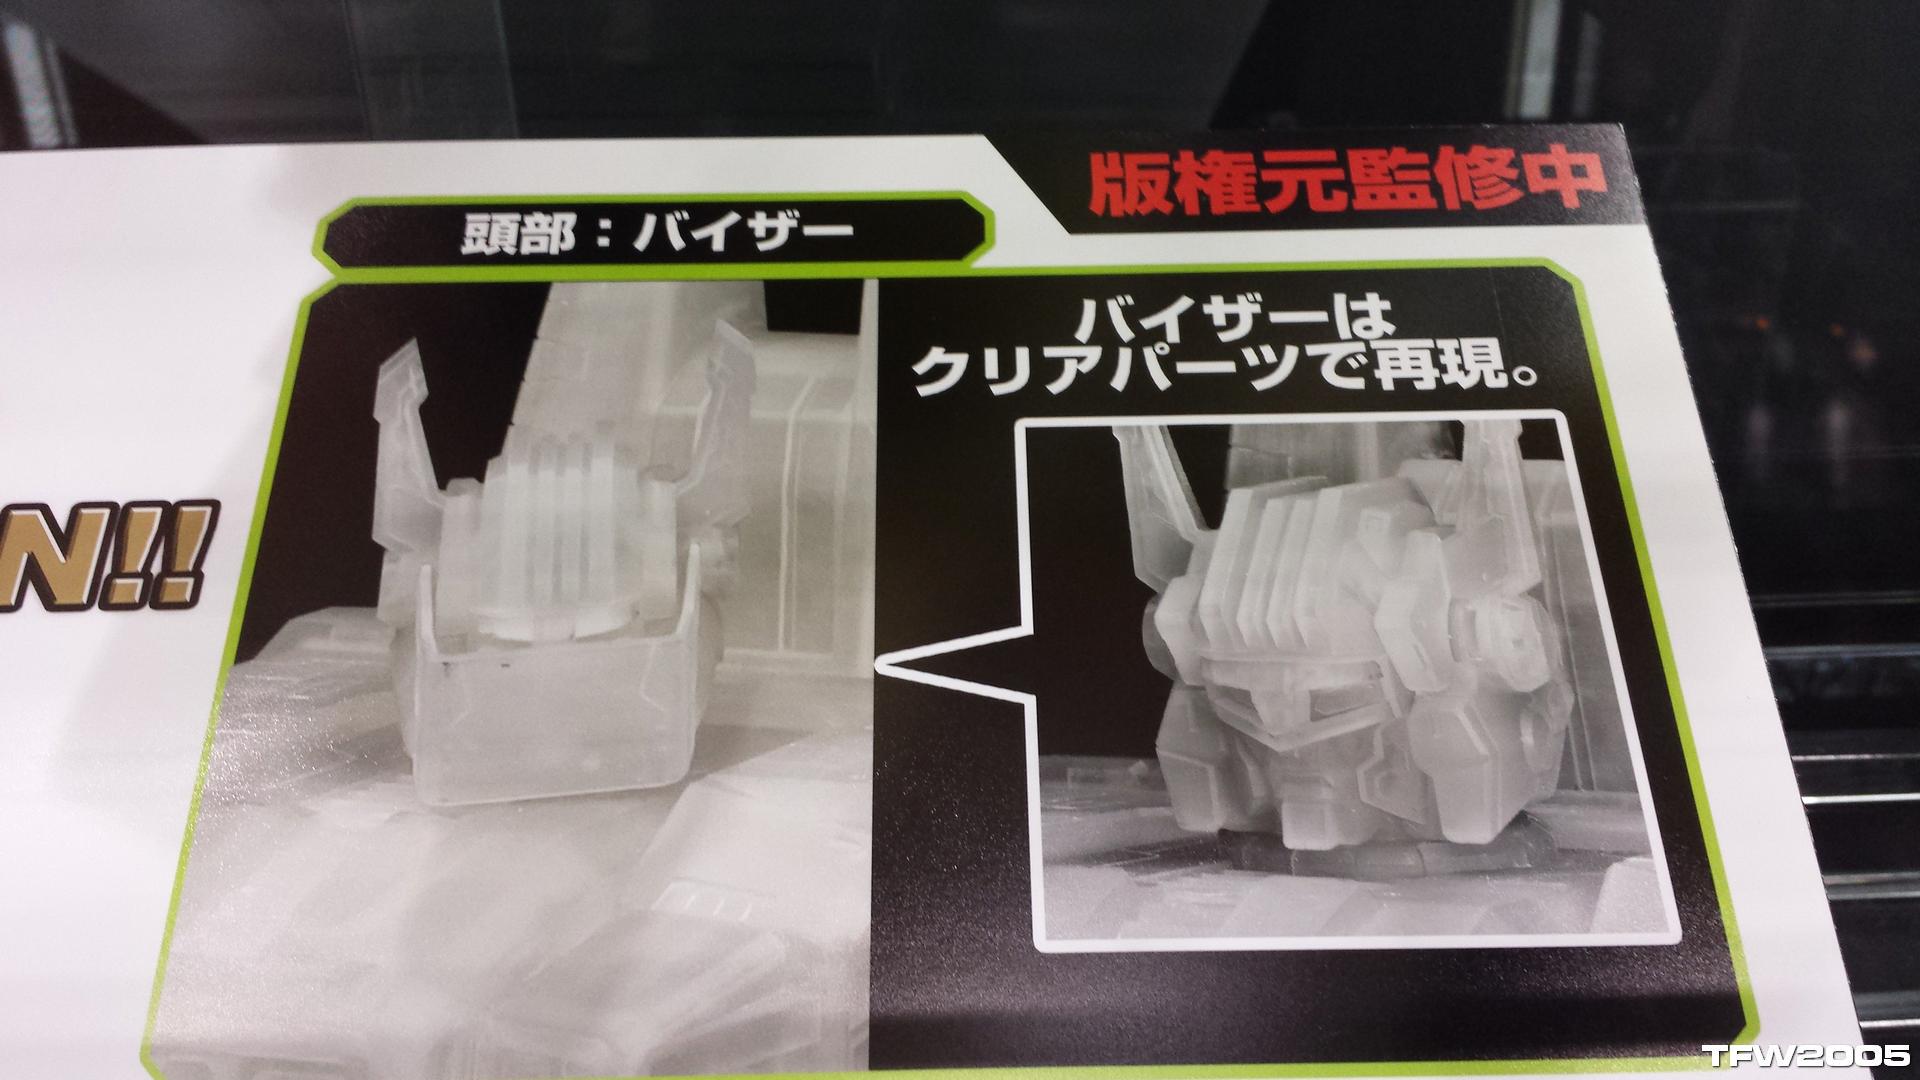 Figurines Transformers G1 (articulé, non transformable) ― Par 3A, Action Toys, Fewture, Toys Alliance, Sentinel, Kotobukiya, Kids Logic, Herocross, EX Gokin, etc Wonderfest-011_1375021507